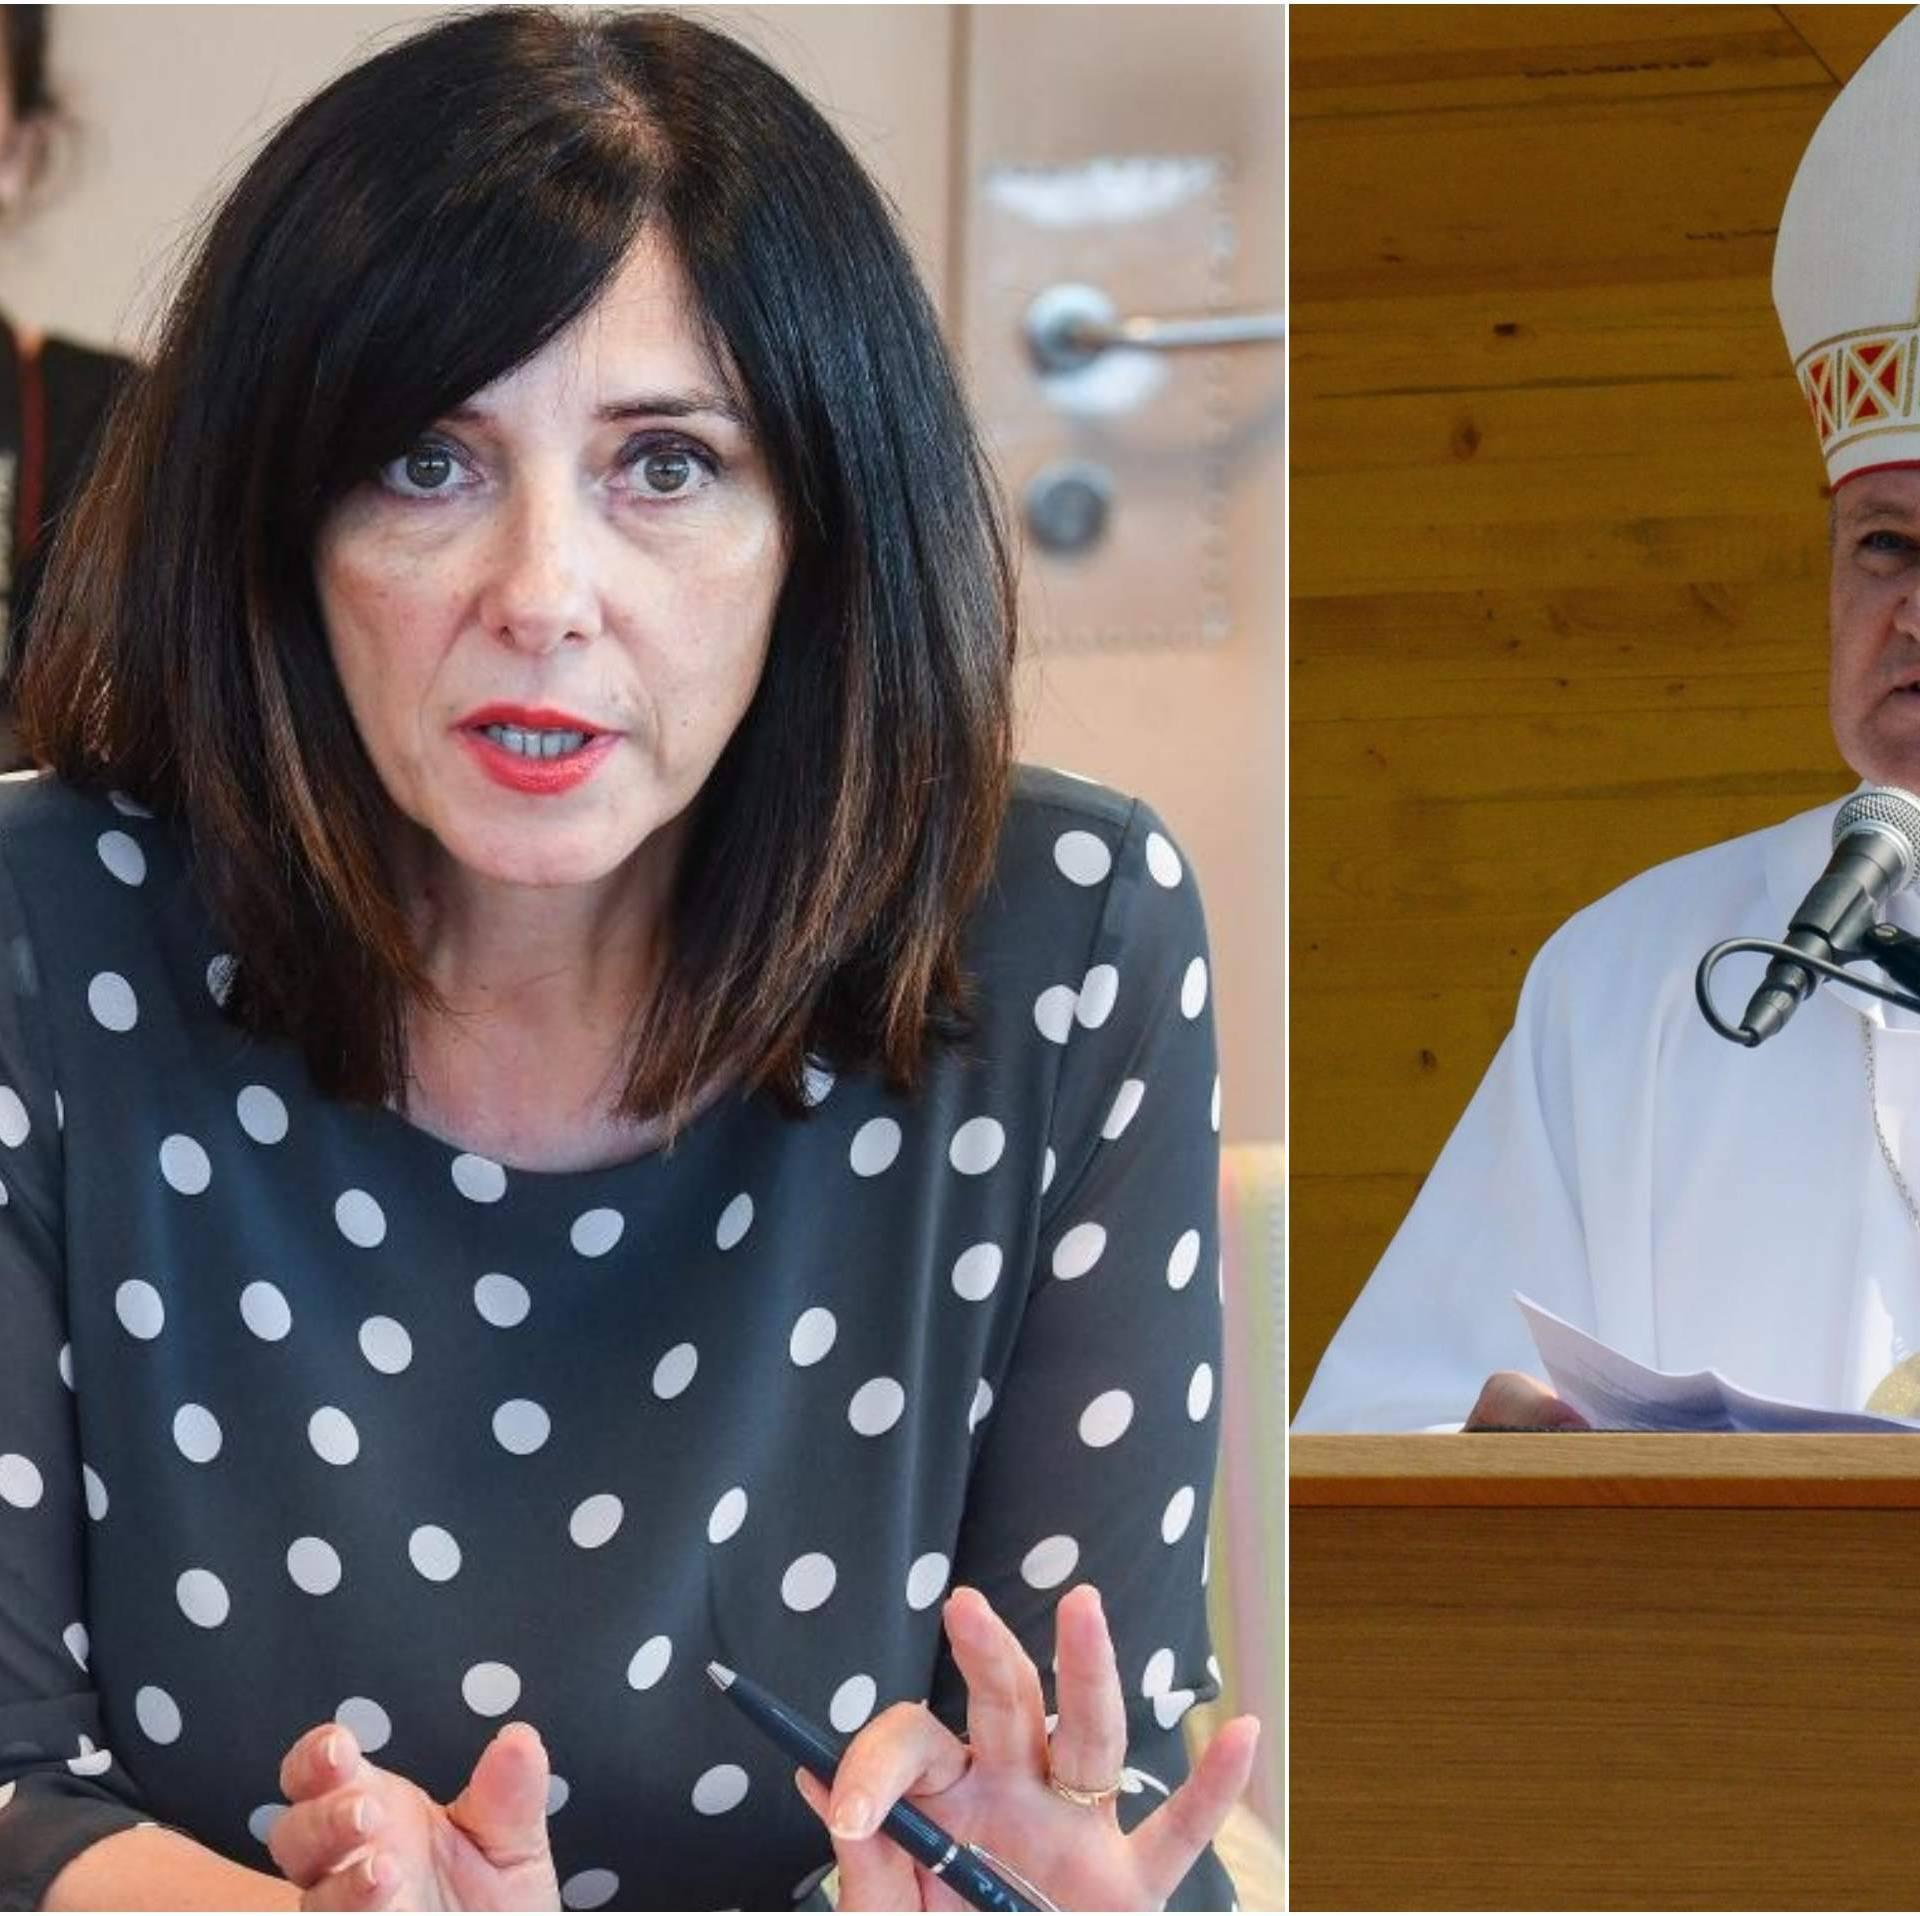 Divjak poručila Košiću: 'Neka se biskupi drže svog resora'